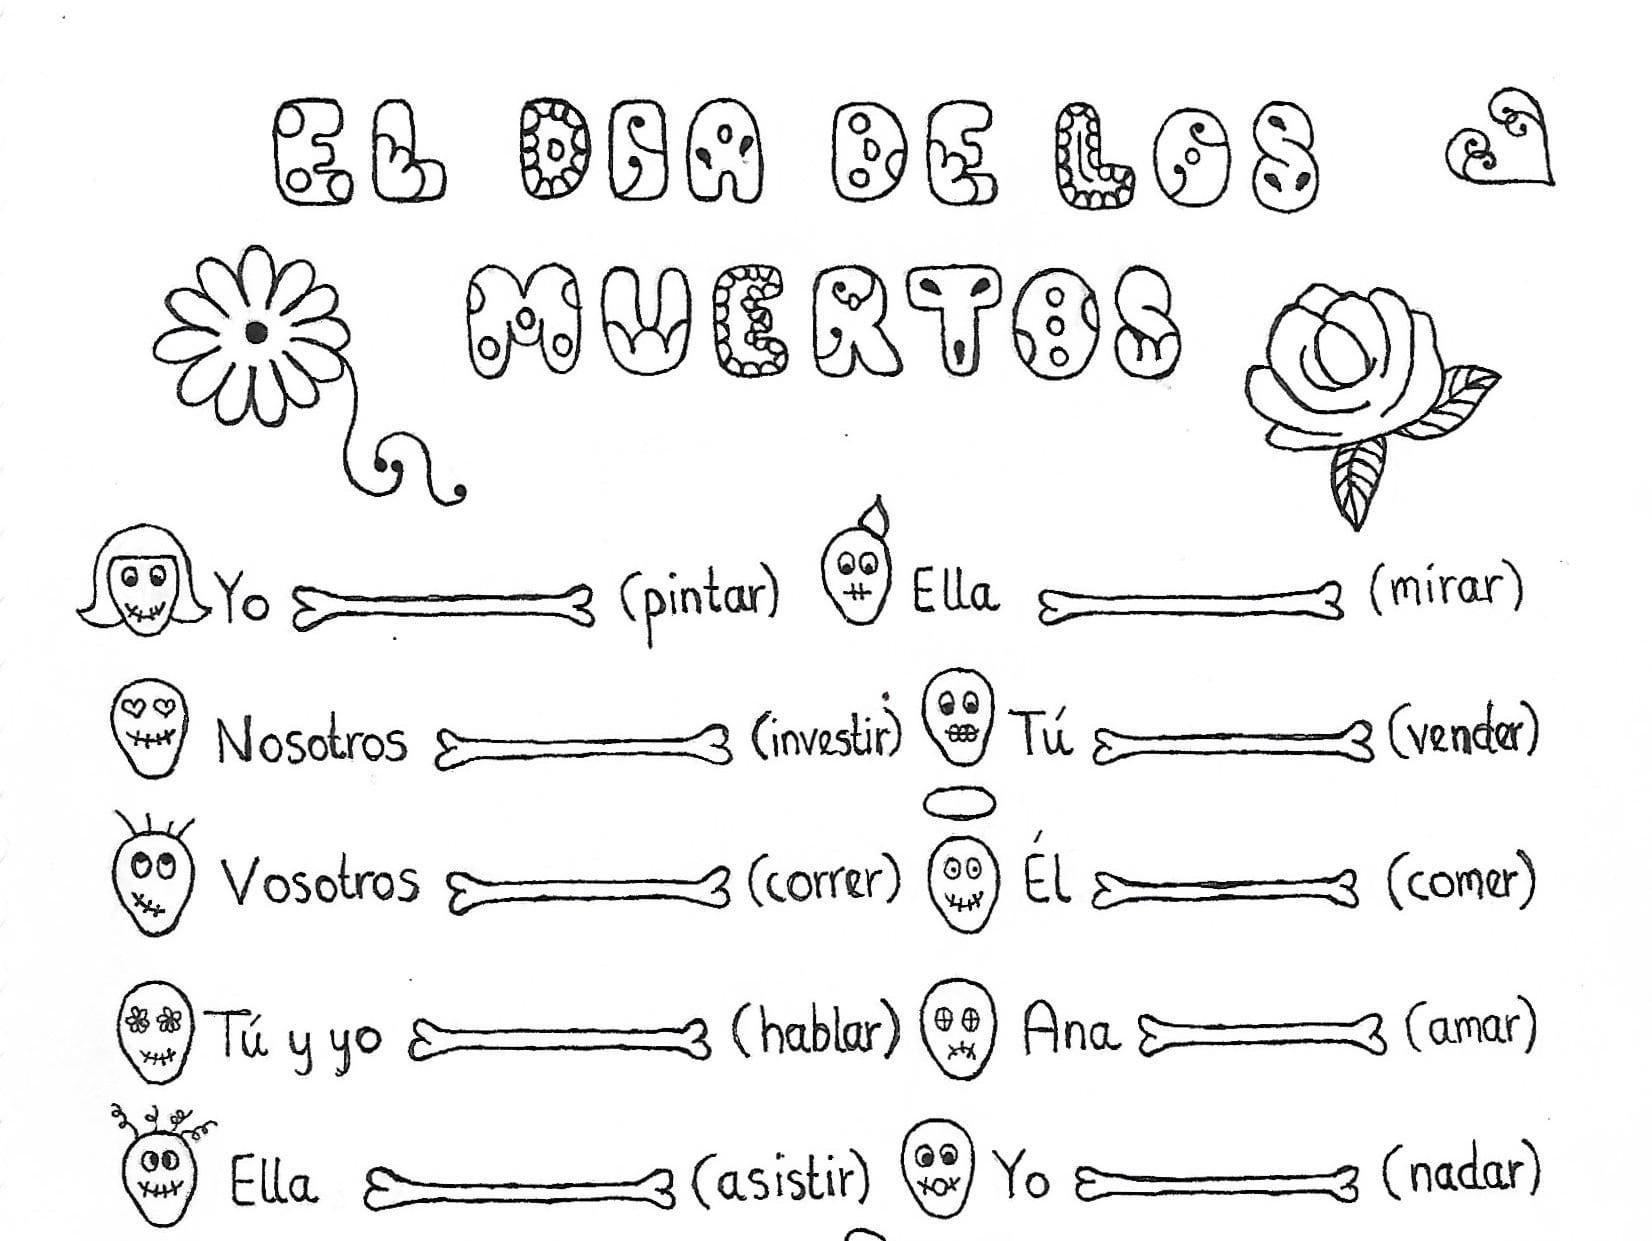 Spanish Verb Conjugation Practice Worksheets